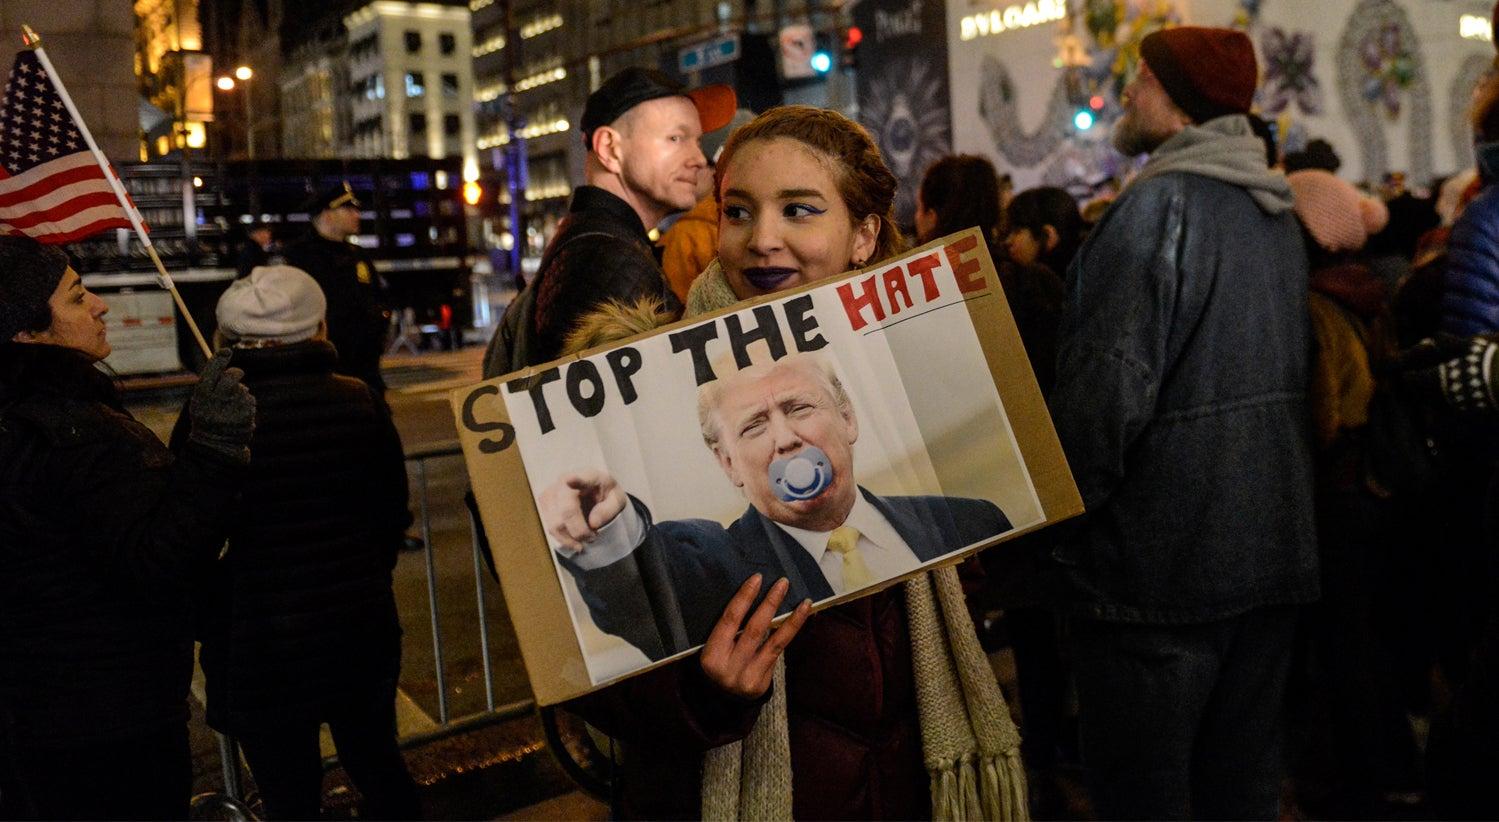 Mundo - Sucedem-se os protestos contra Trump